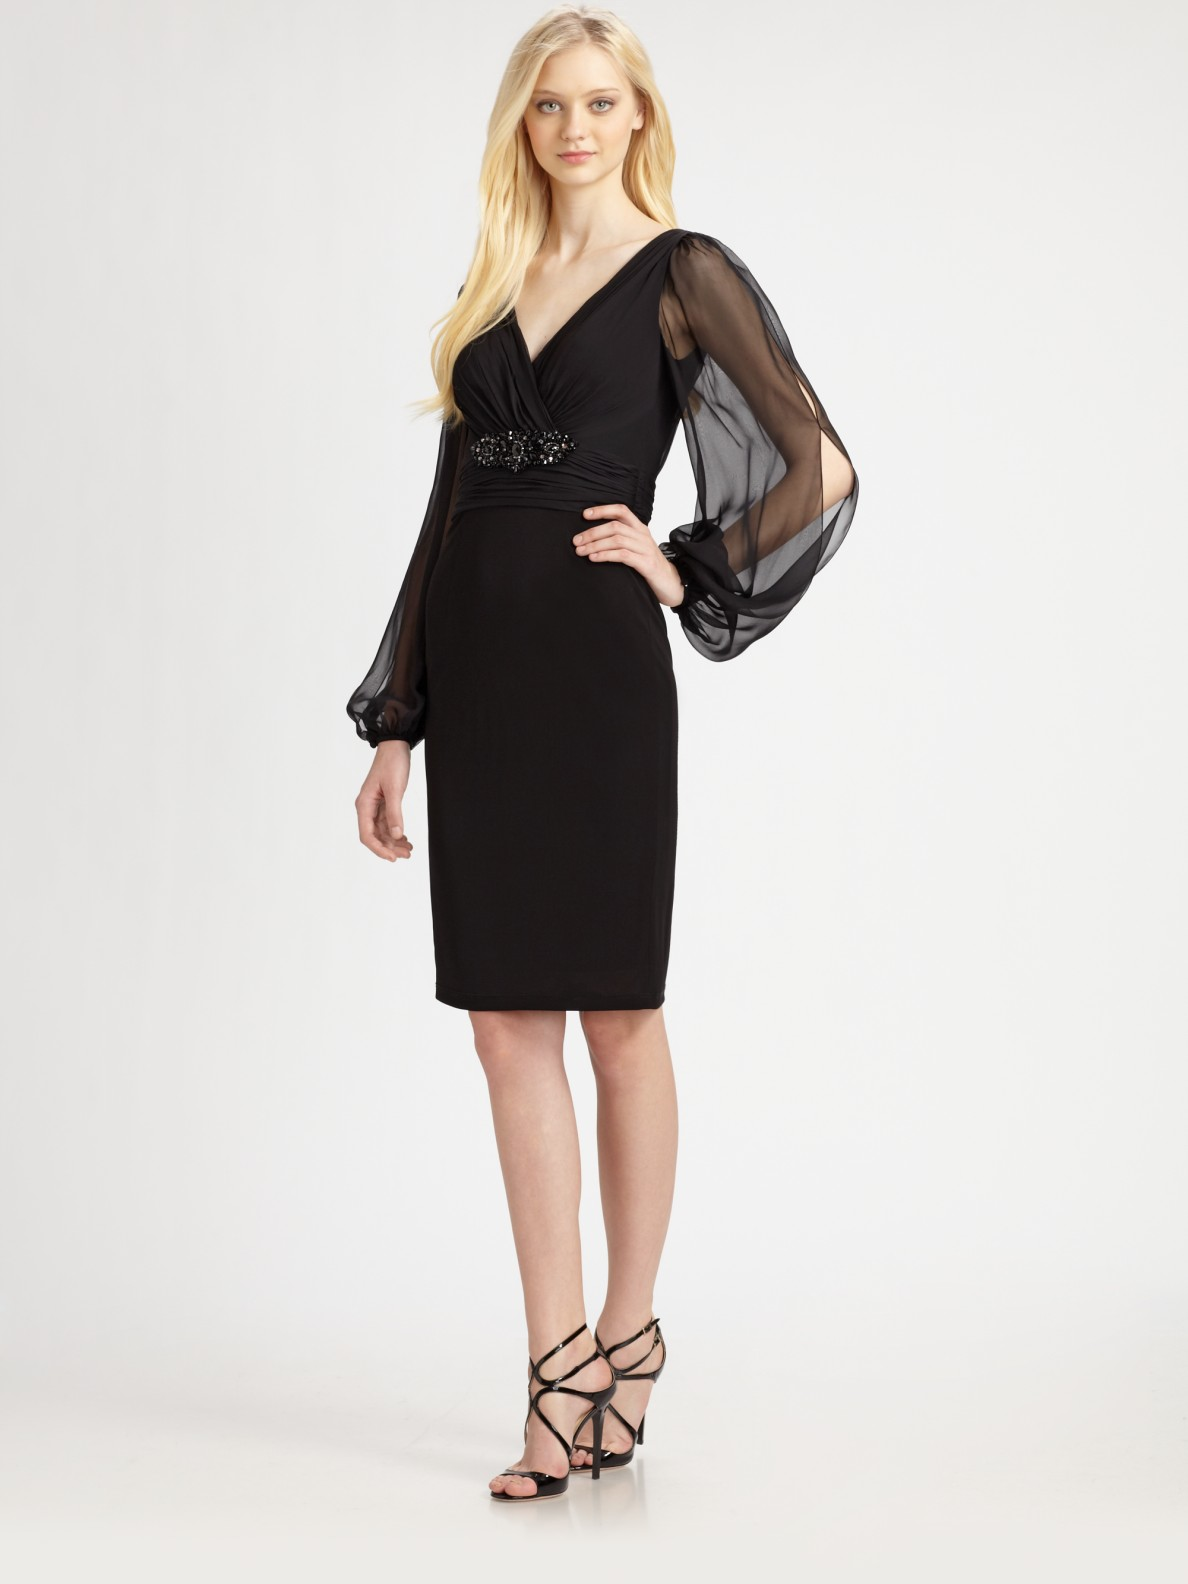 Chiffon sleeved cocktail dress